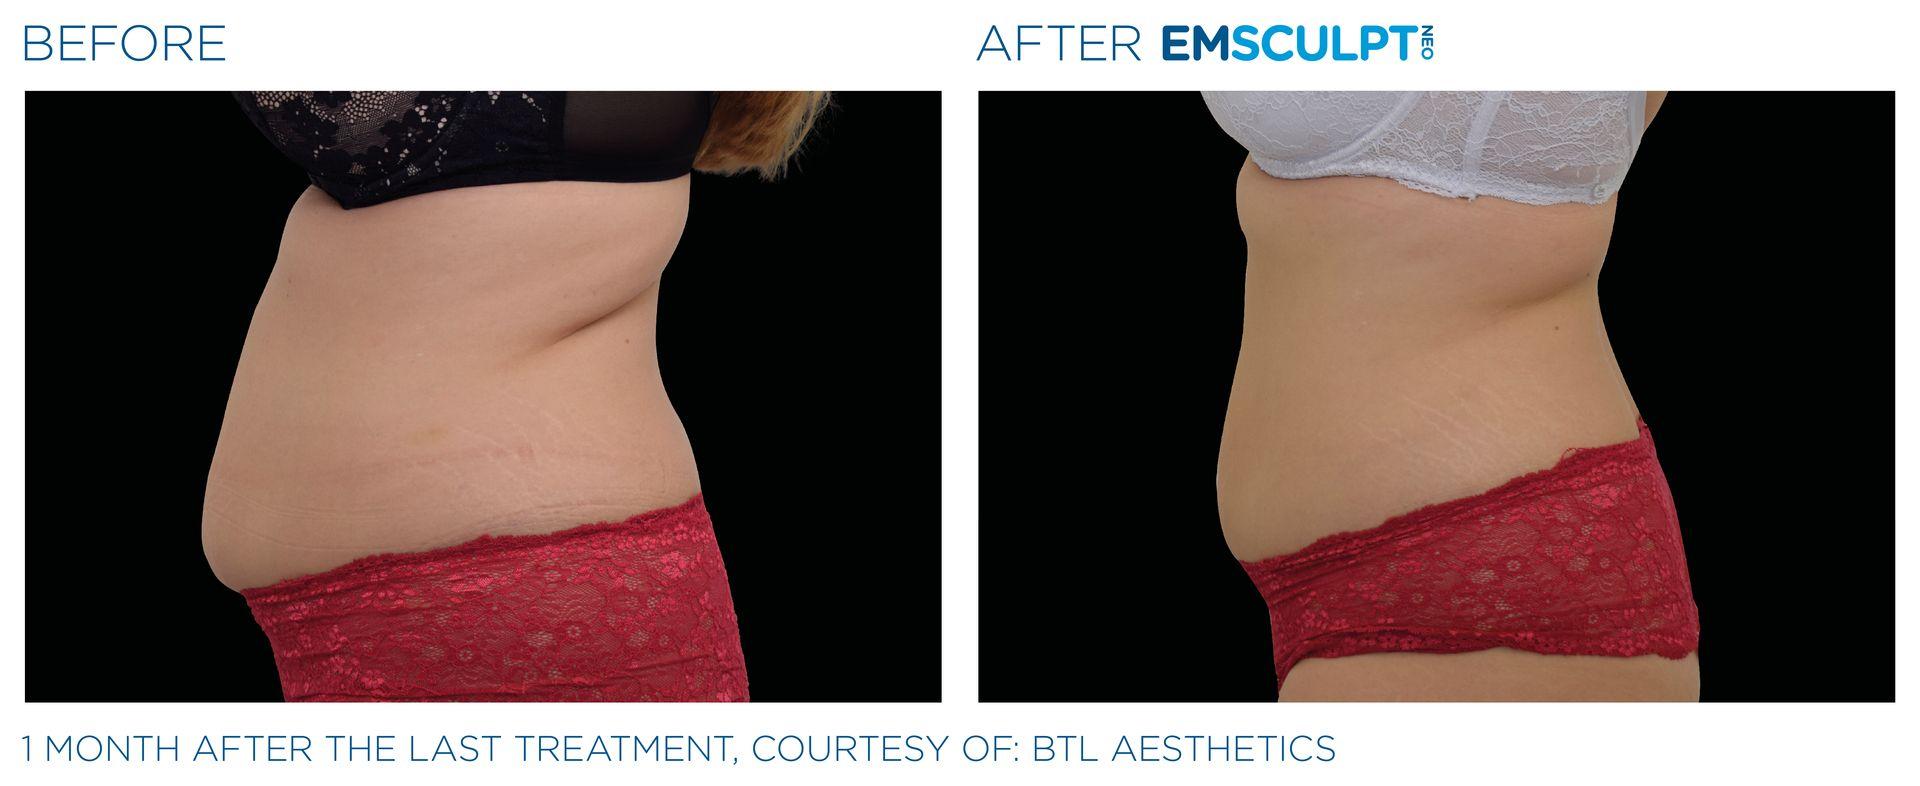 Emsculpt_neo_PIC_Ba-card-female-abdomen-025